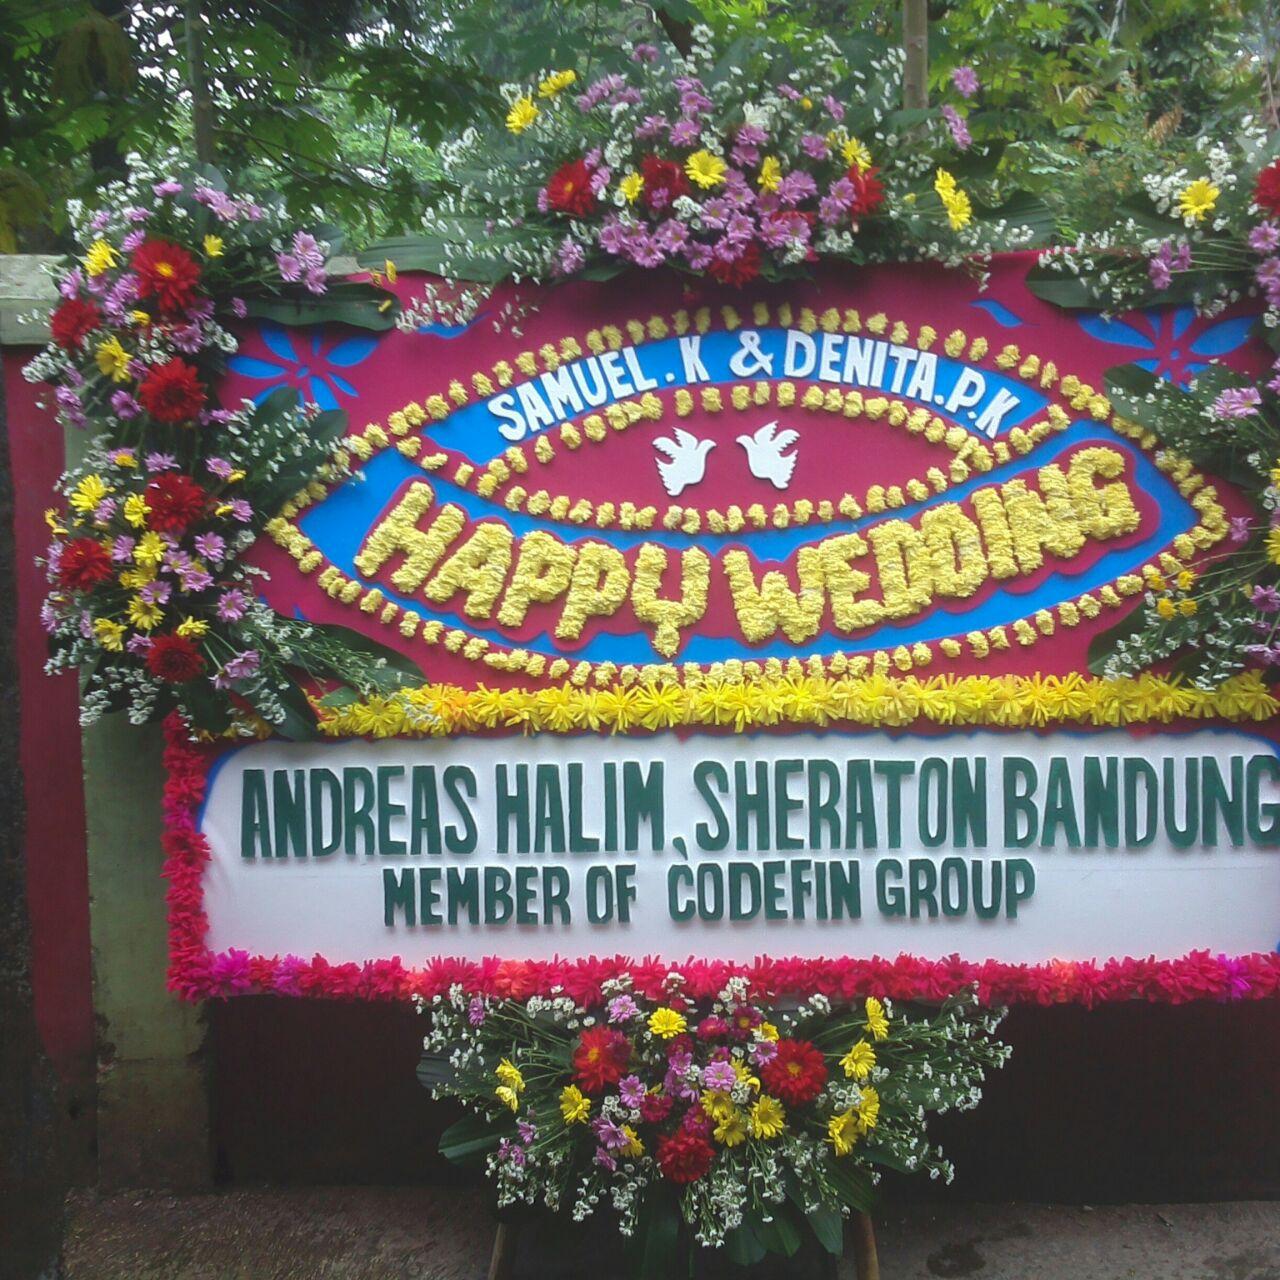 Toko Bunga Surabaya 085772762443 Pedia Karangan Papan Rangkaian Jual Pasar